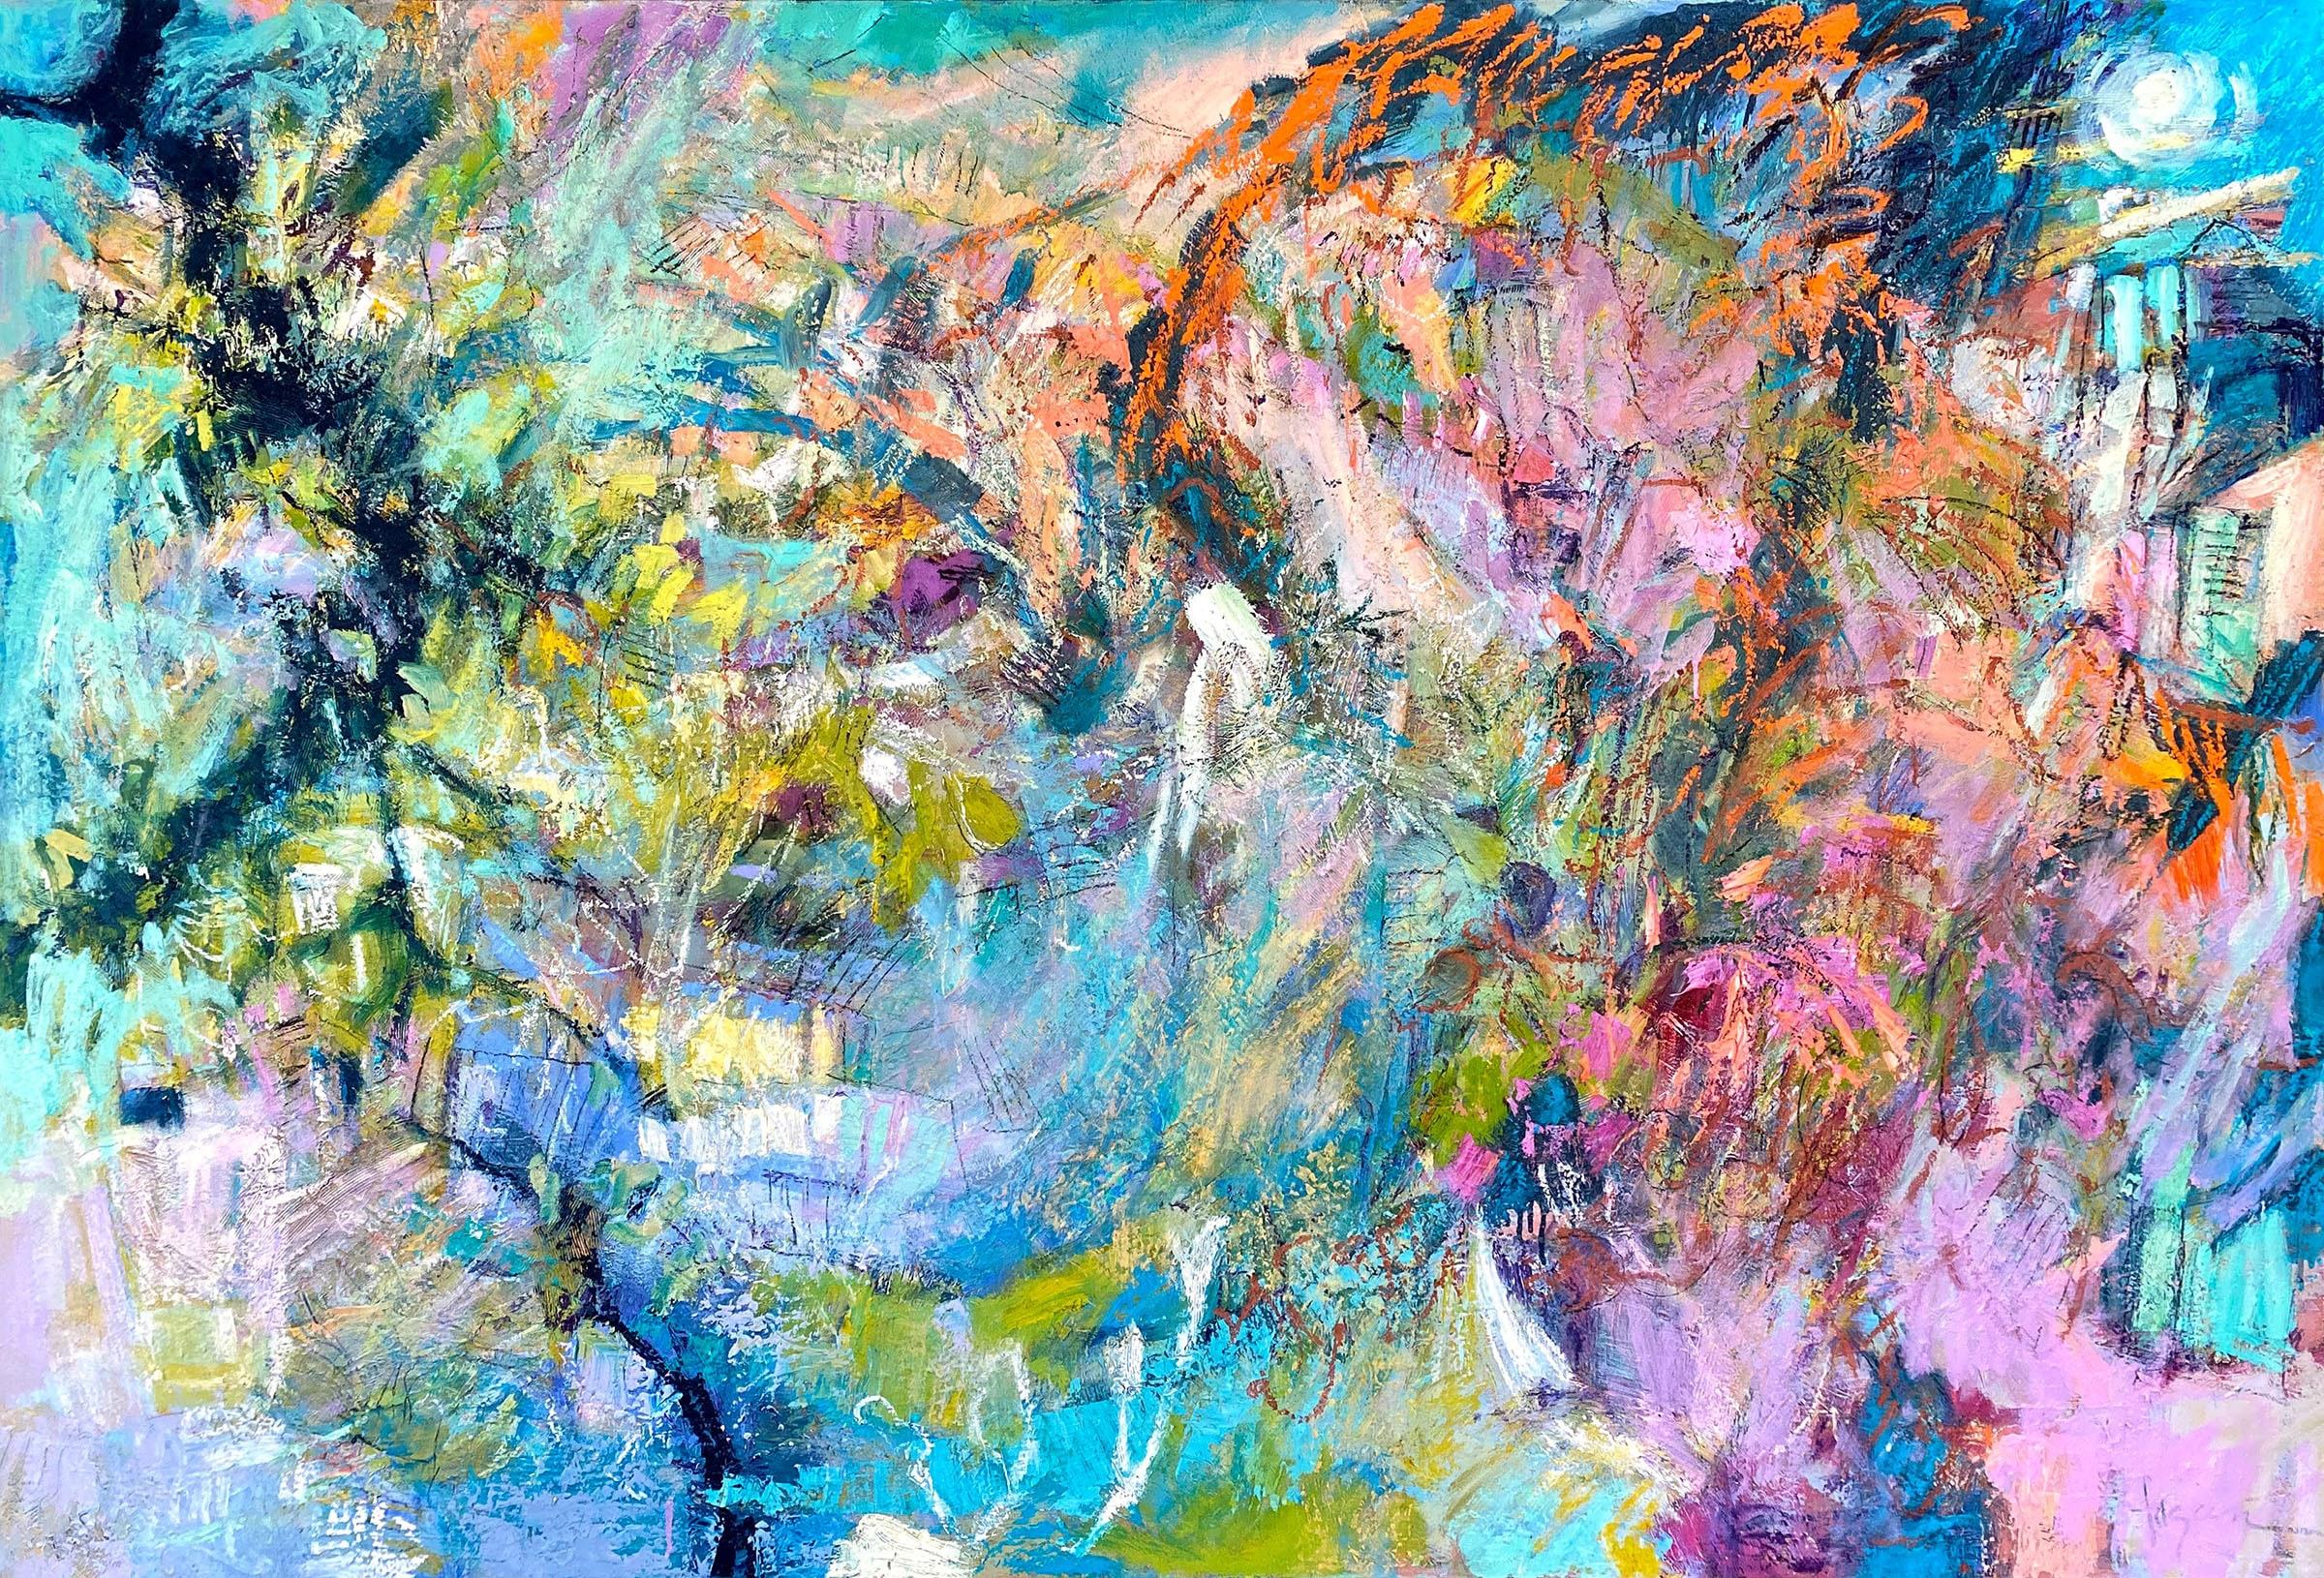 <div class='title'>           Sparkling in My Garden by the Sea         </div>                 <div class='description'>           Original Oil Painting & Large Canvas Print         </div>